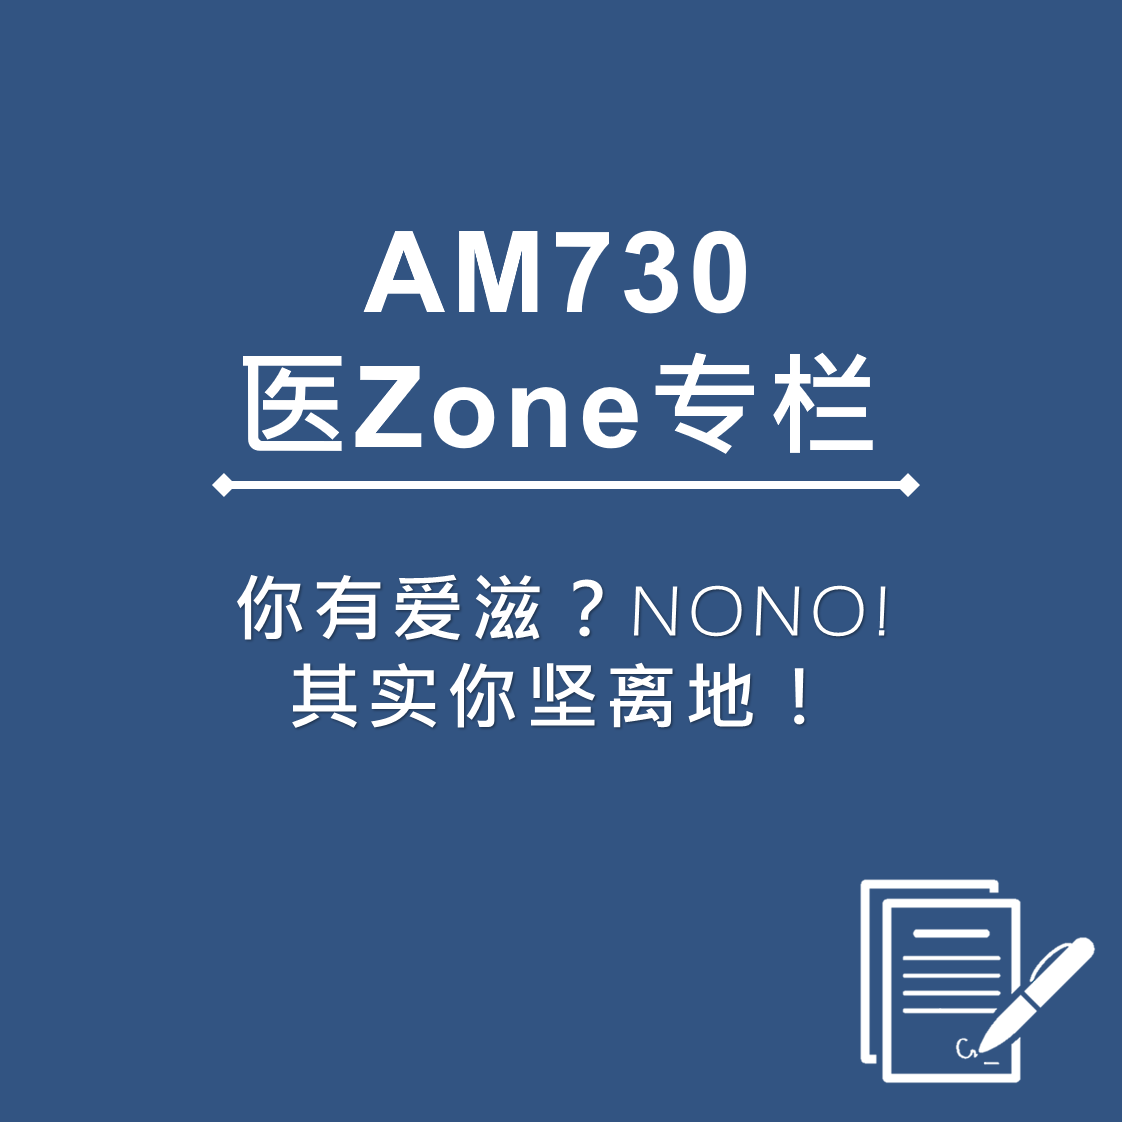 AM730 医Zone 专栏 - 你有爱滋?NONO! 其实你坚离地!